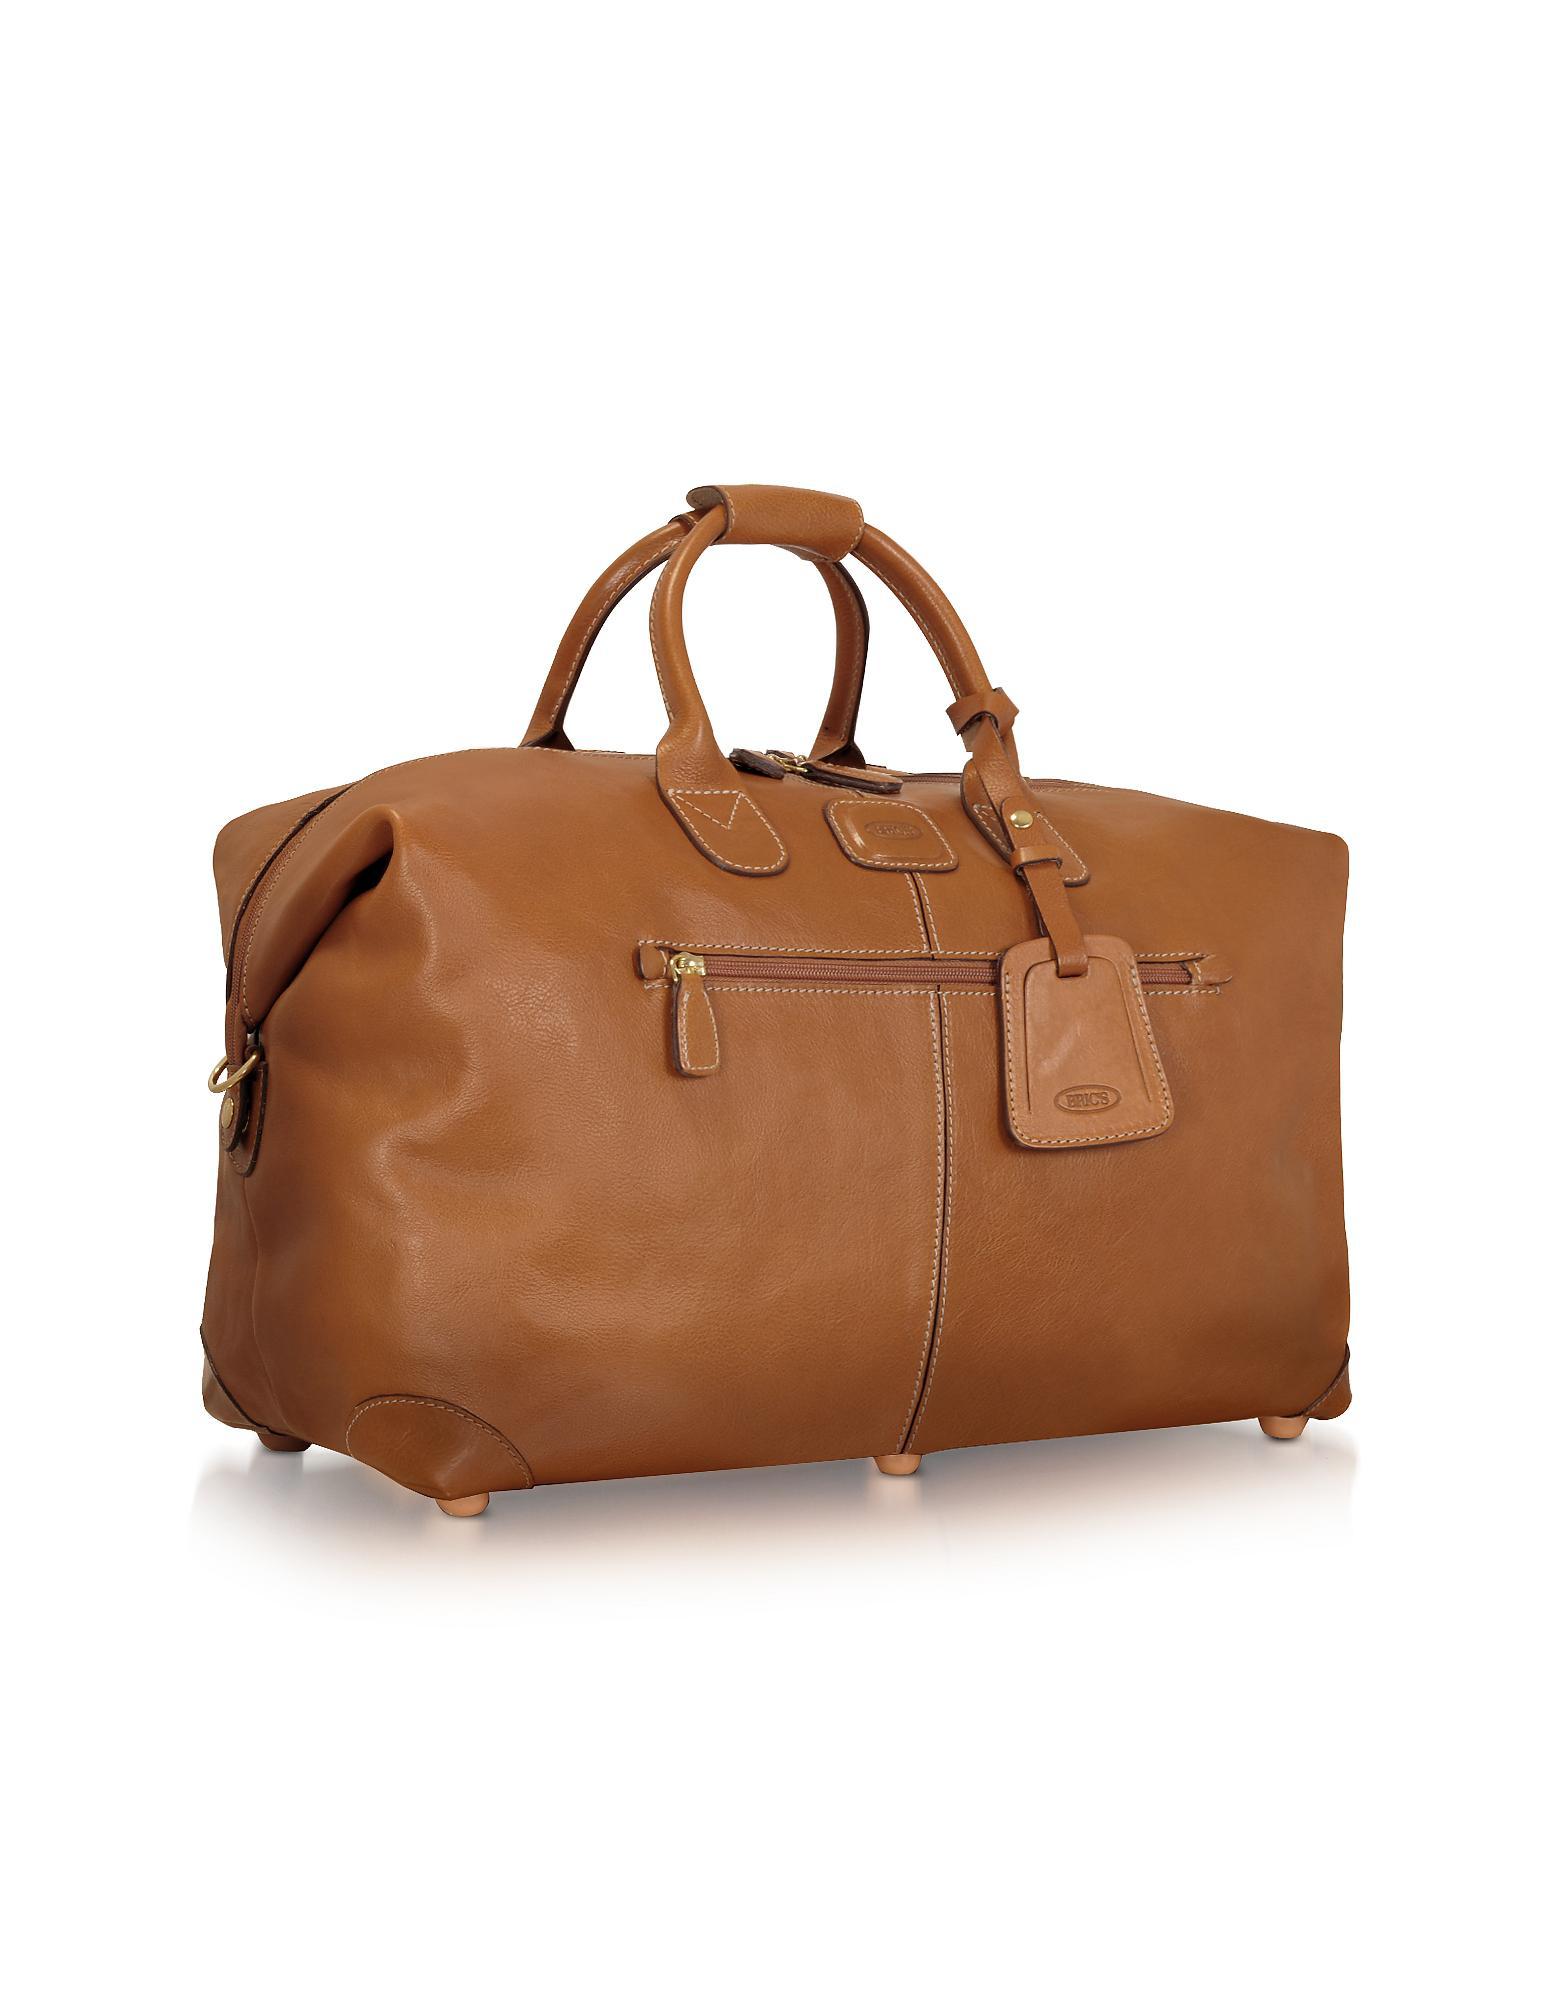 36e73db4efc1 Bric S Life Pelle - Medium Leather Travel Bag in Brown for Men - Lyst